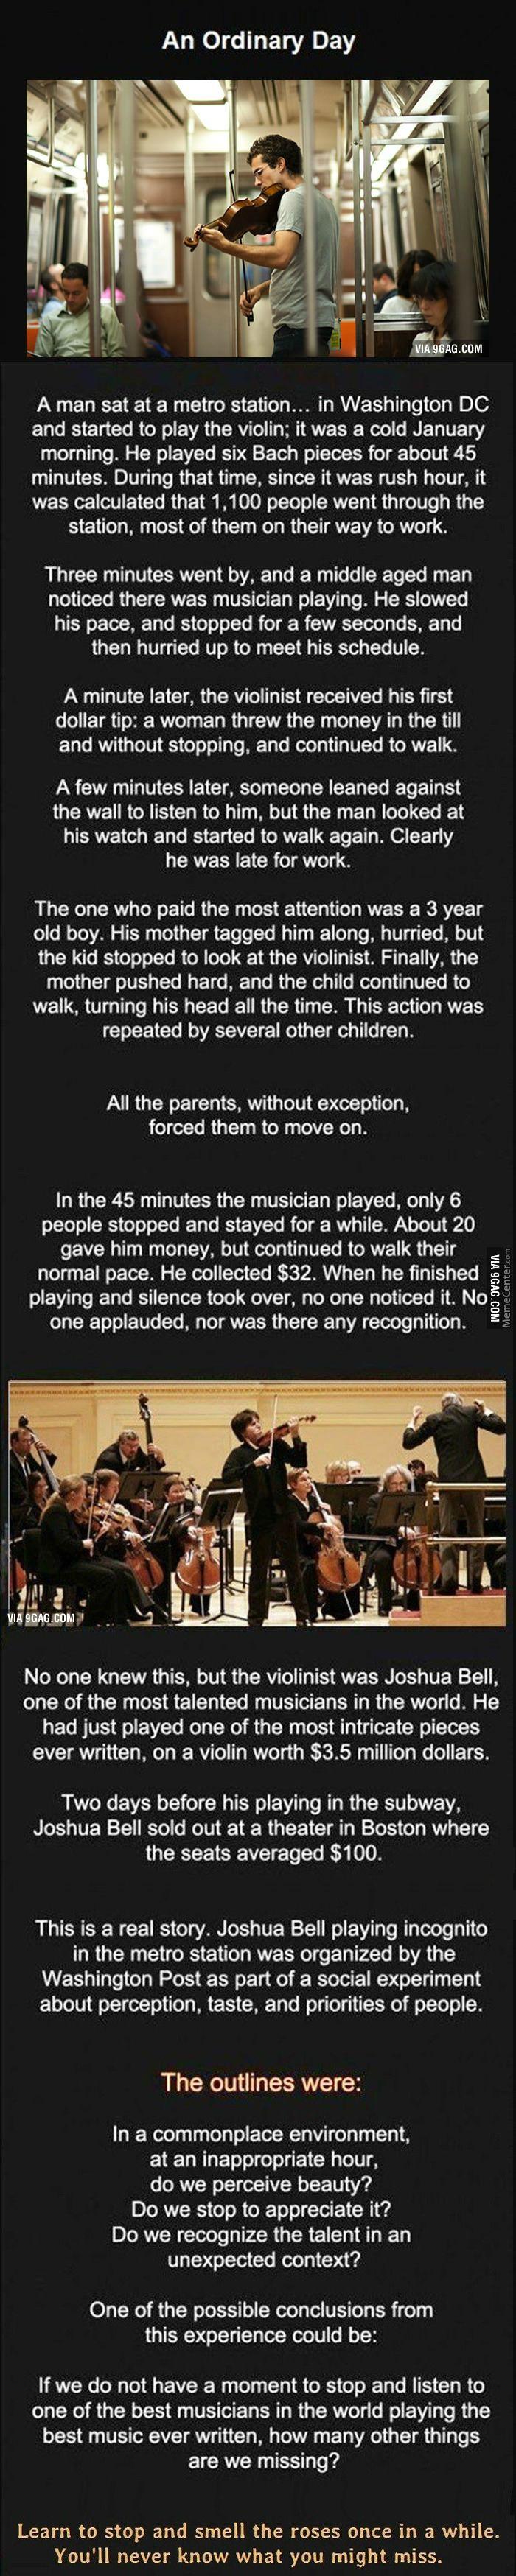 Brings a tear my my musical eye.